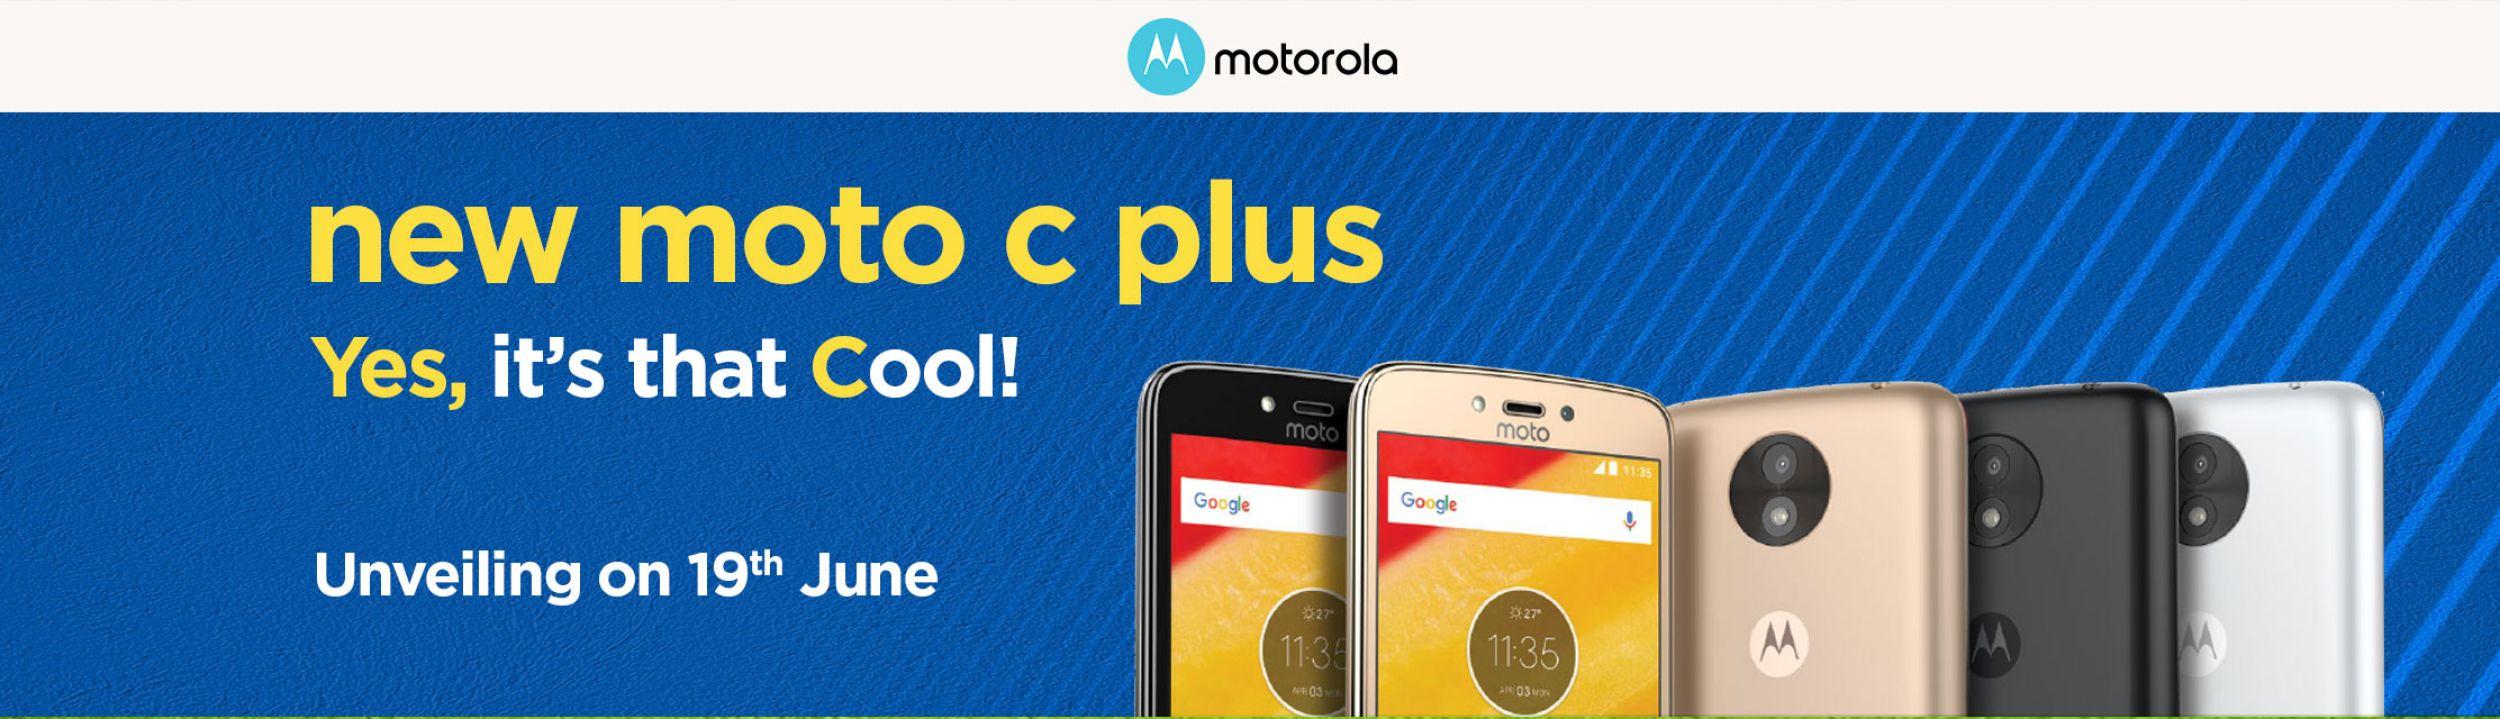 Moto_CPlus_1